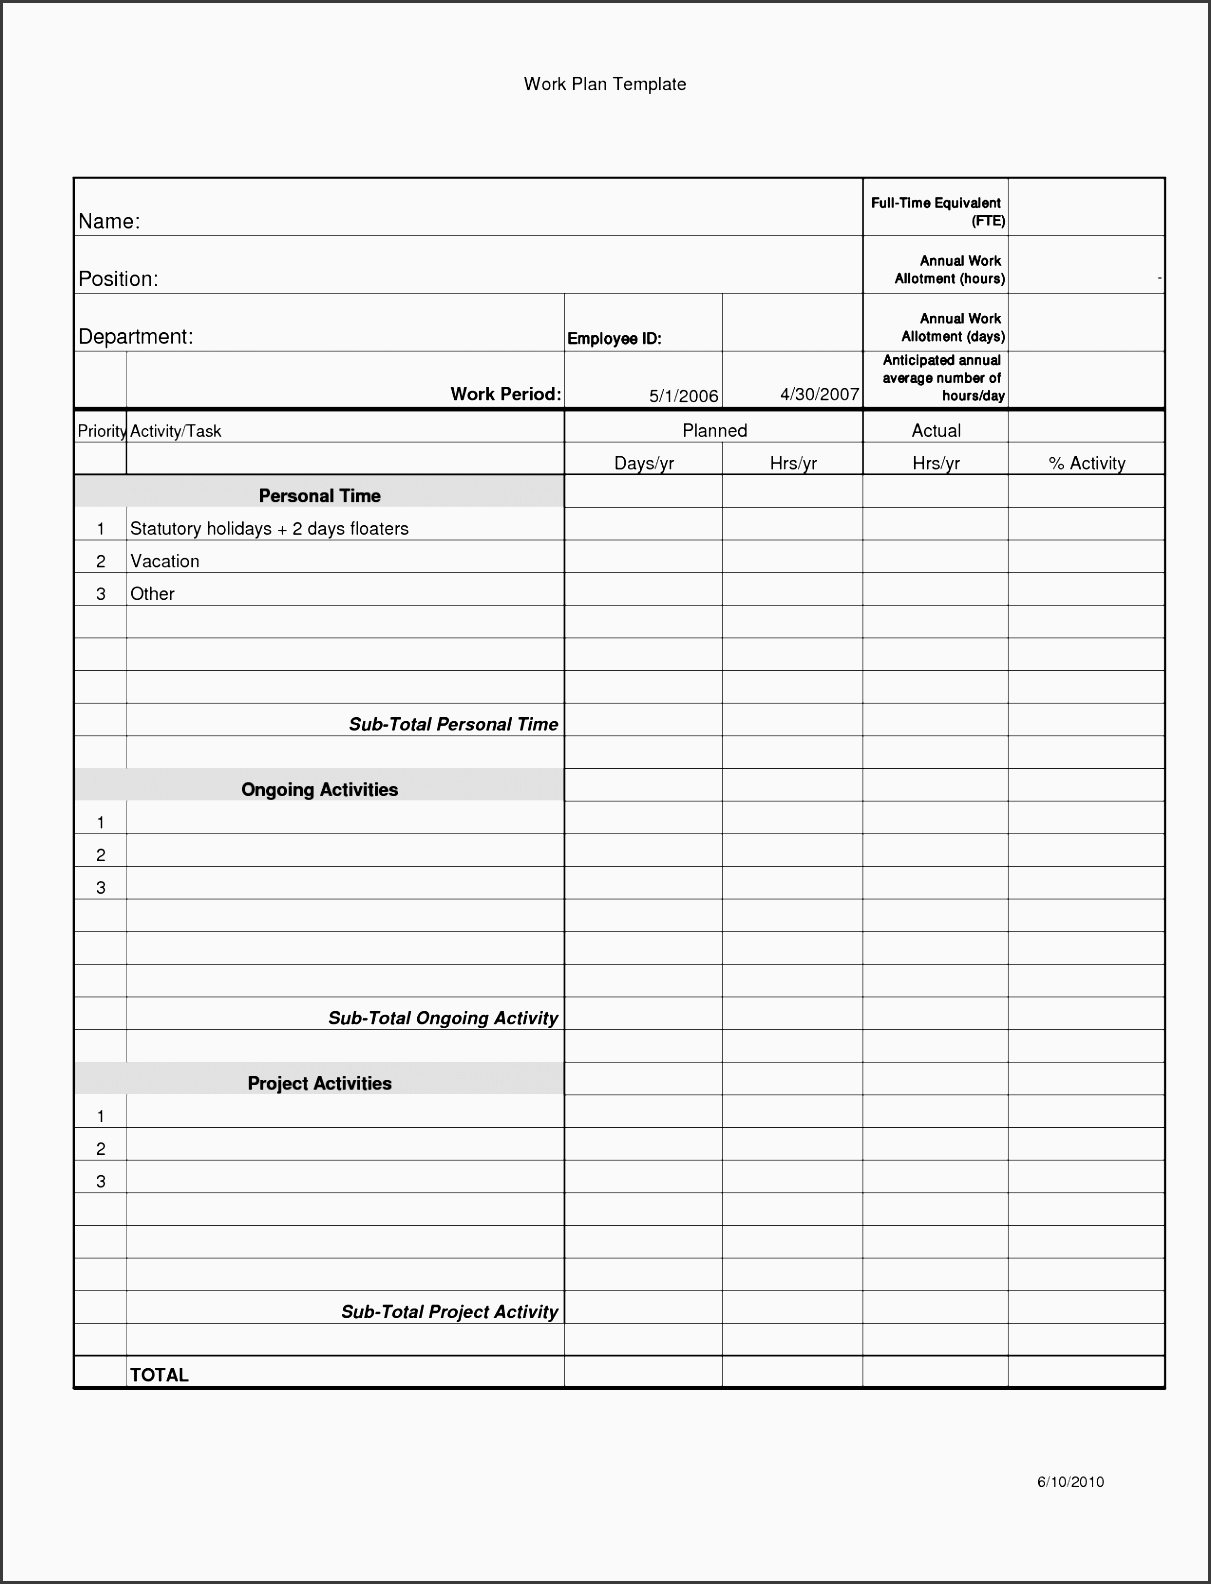 7 Staff Training Plan Sample SampleTemplatess